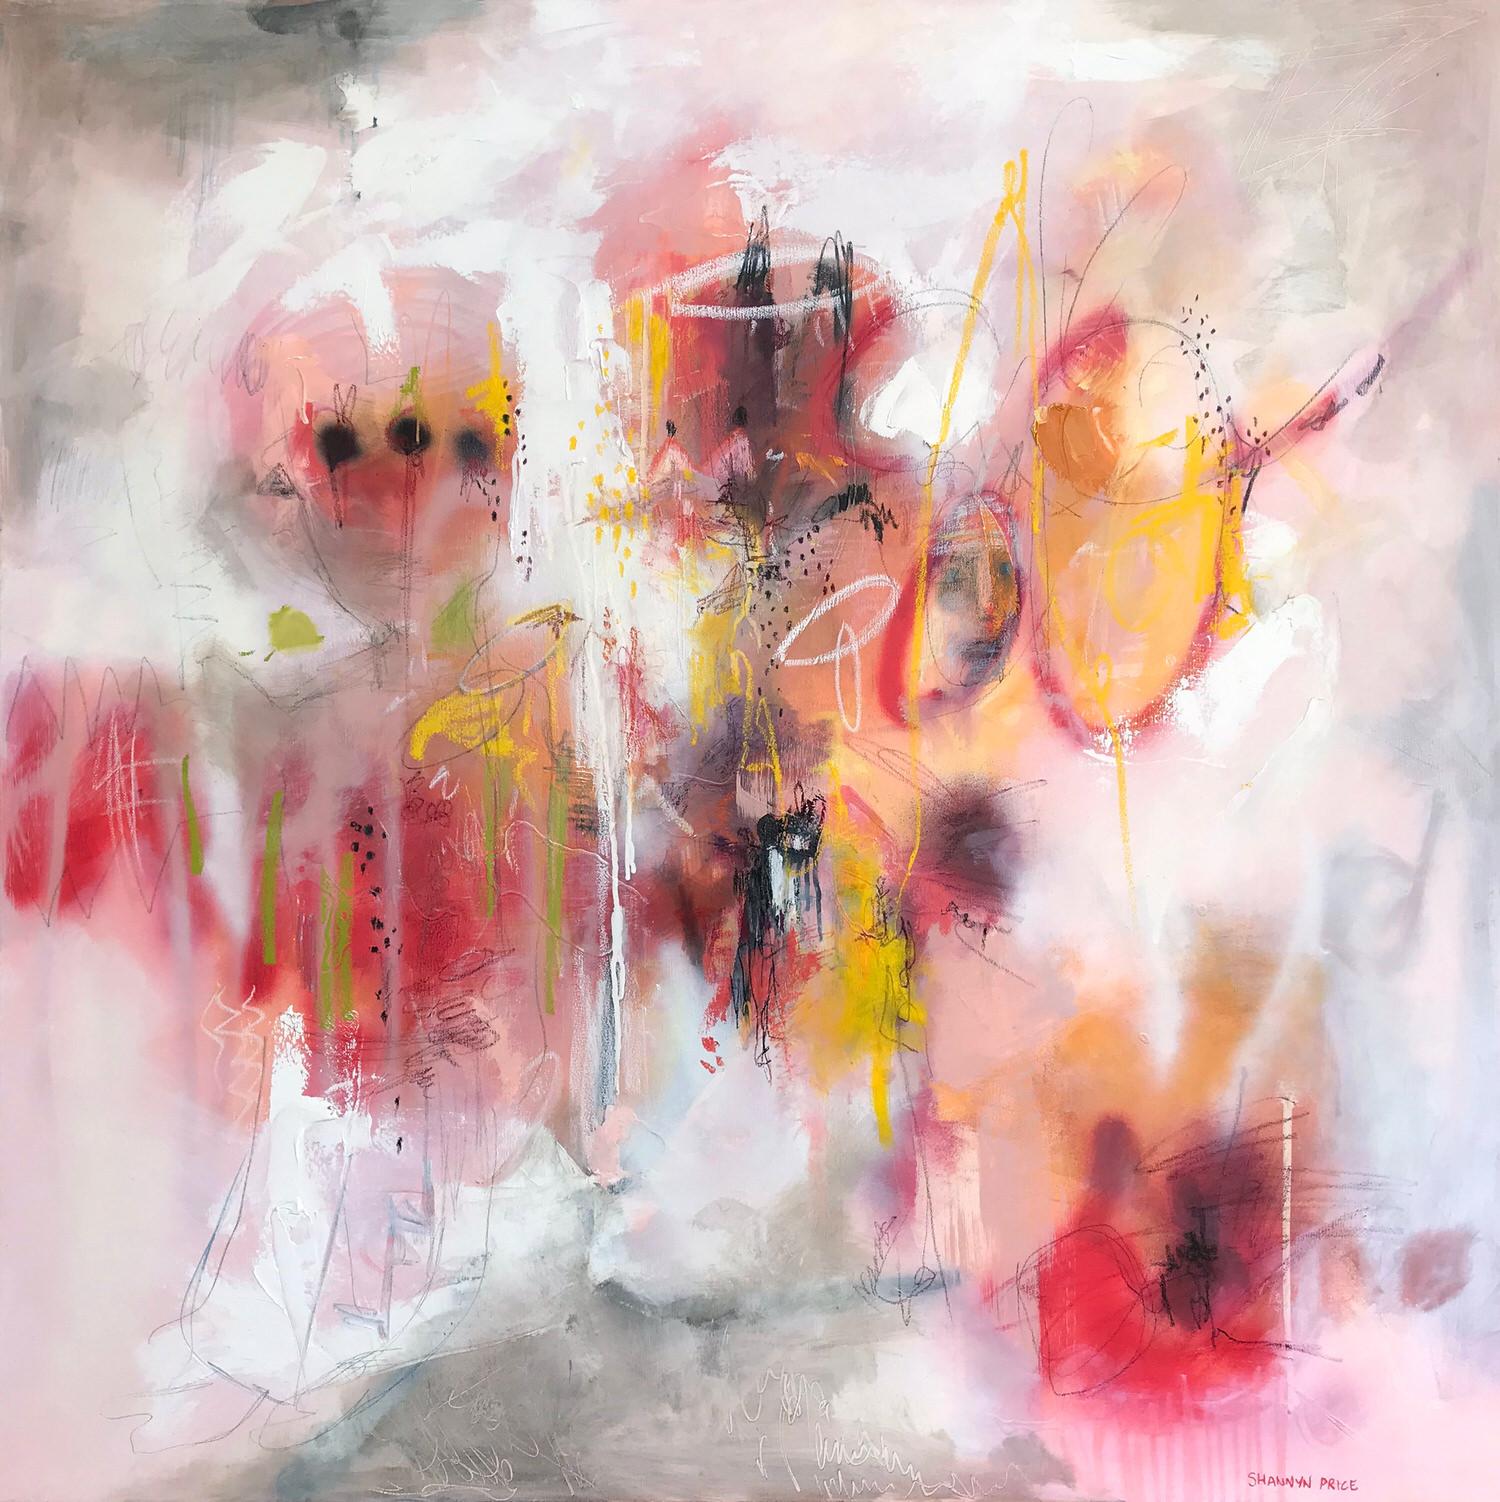 Shannyn Alexene PriceI Make it So, 2019 Mixed Media on Canvas 122 x 122 cm.jpg